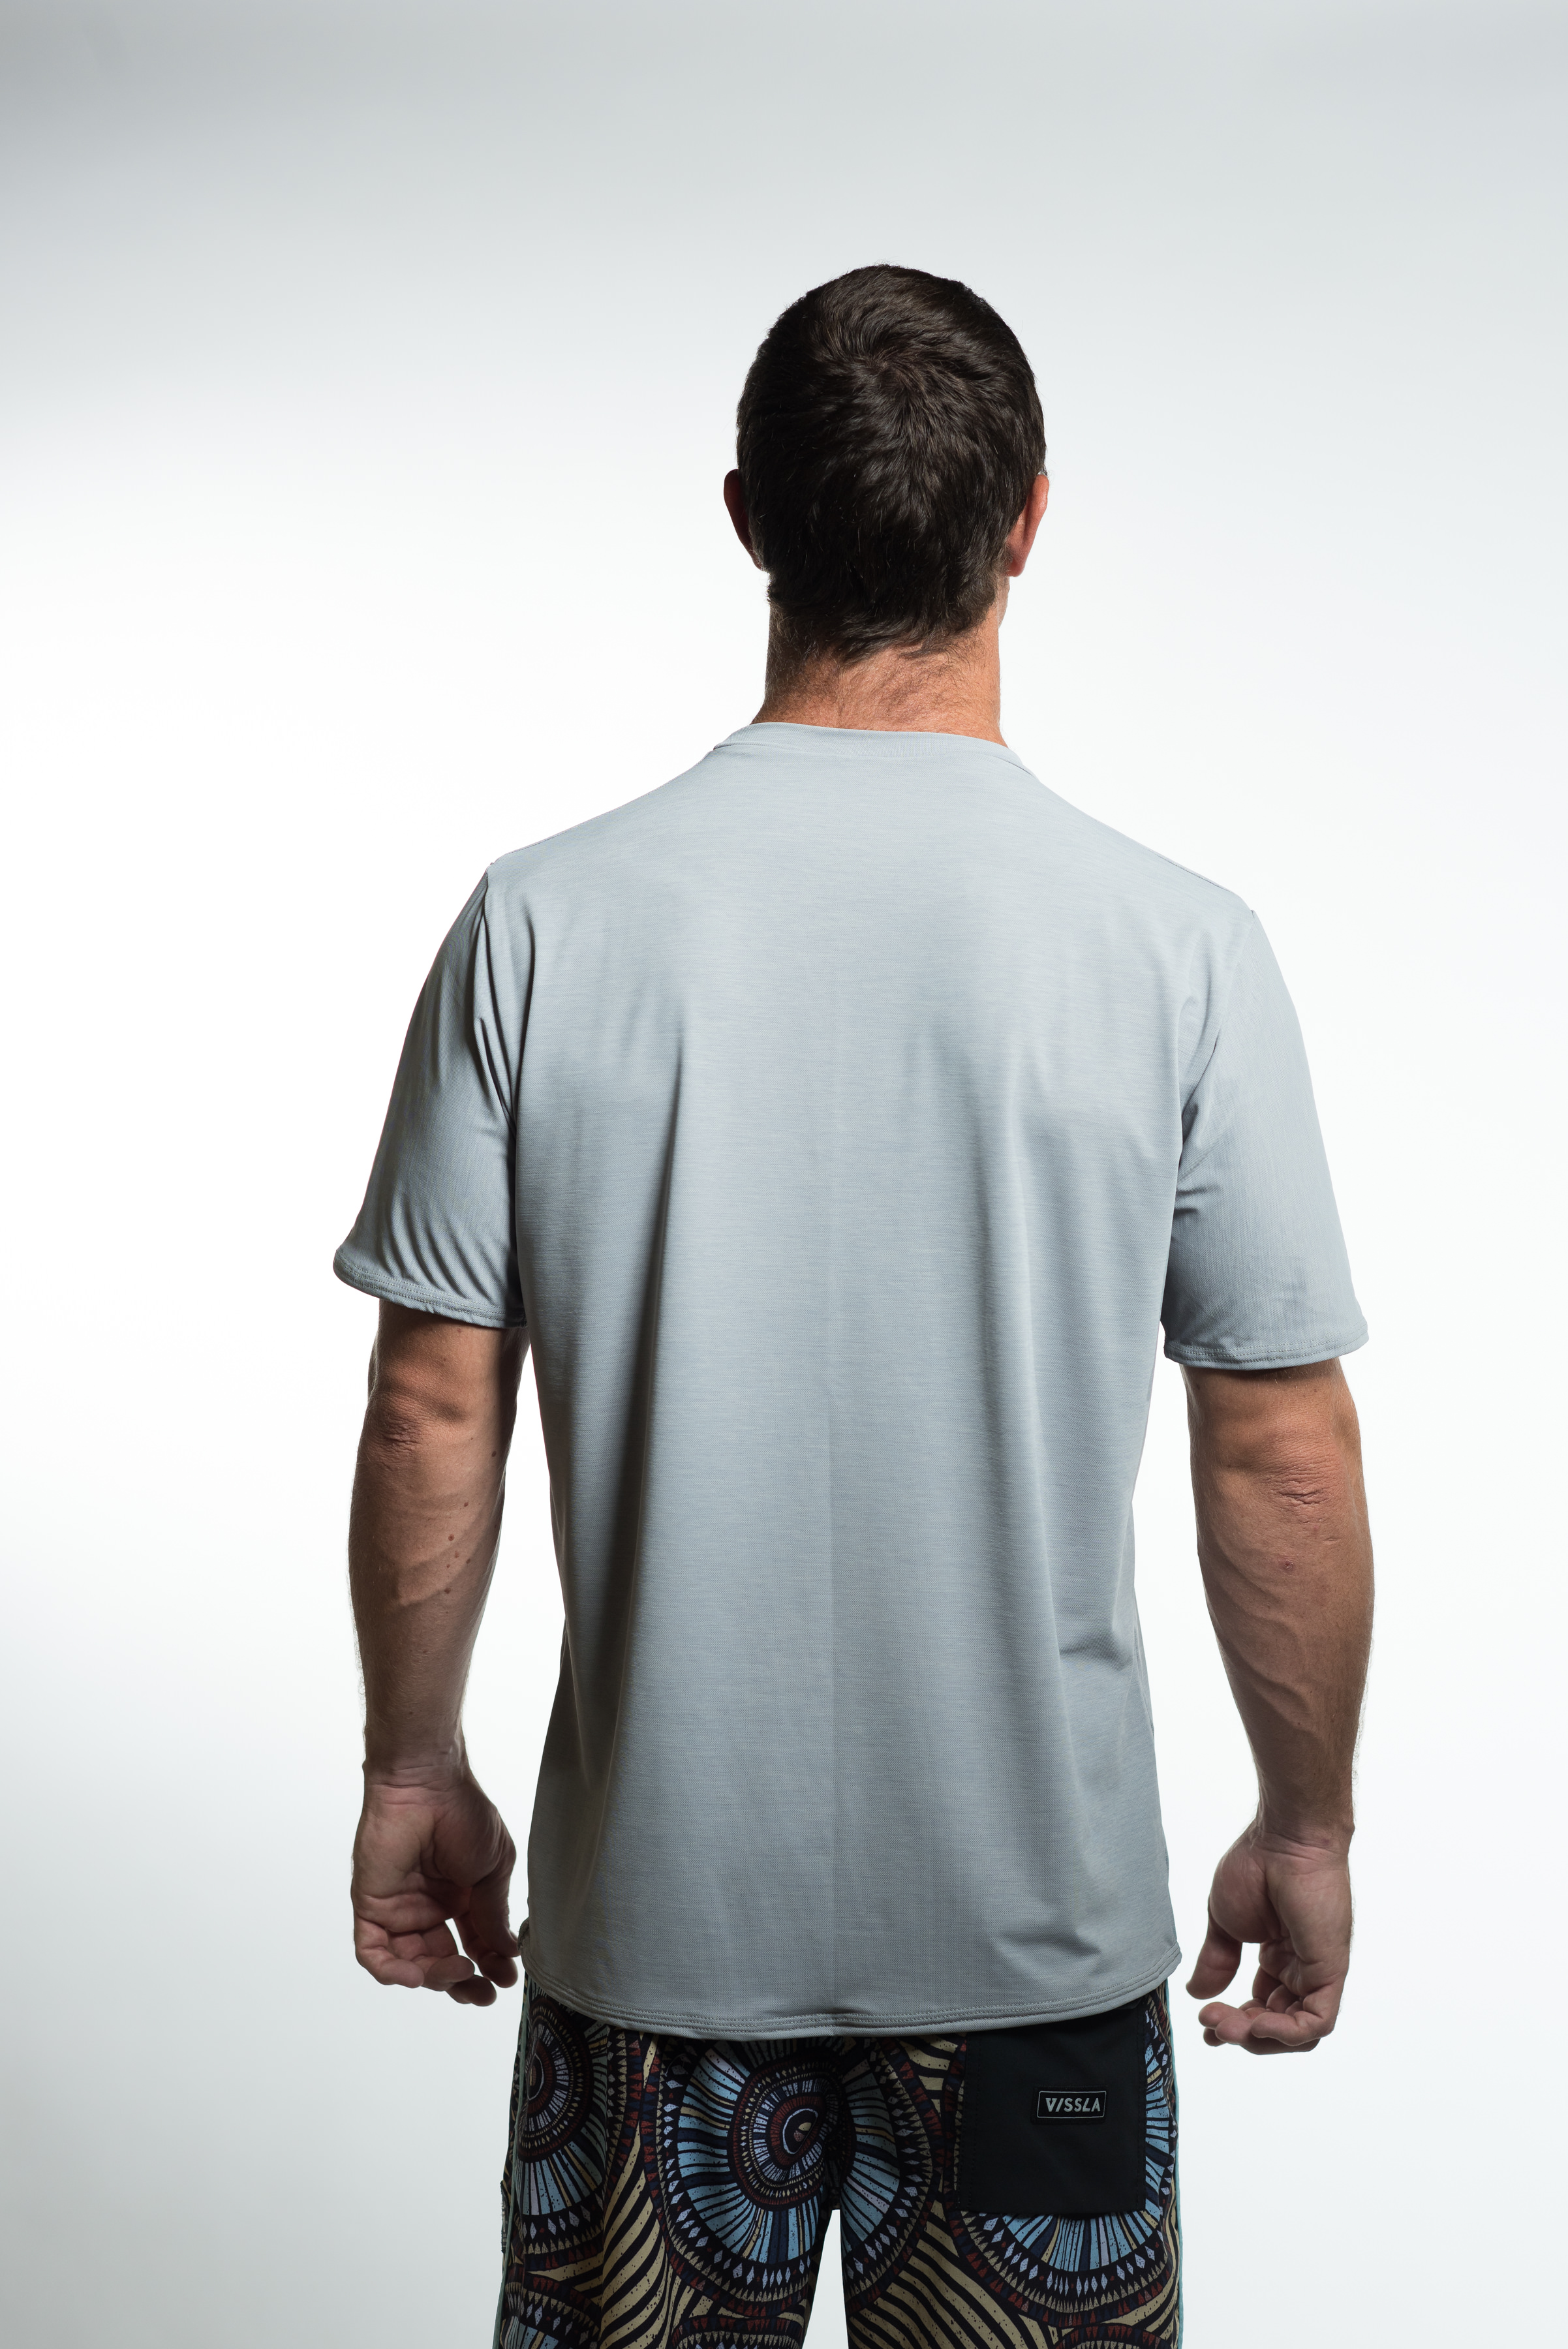 OT Mens #5111 heather Grey